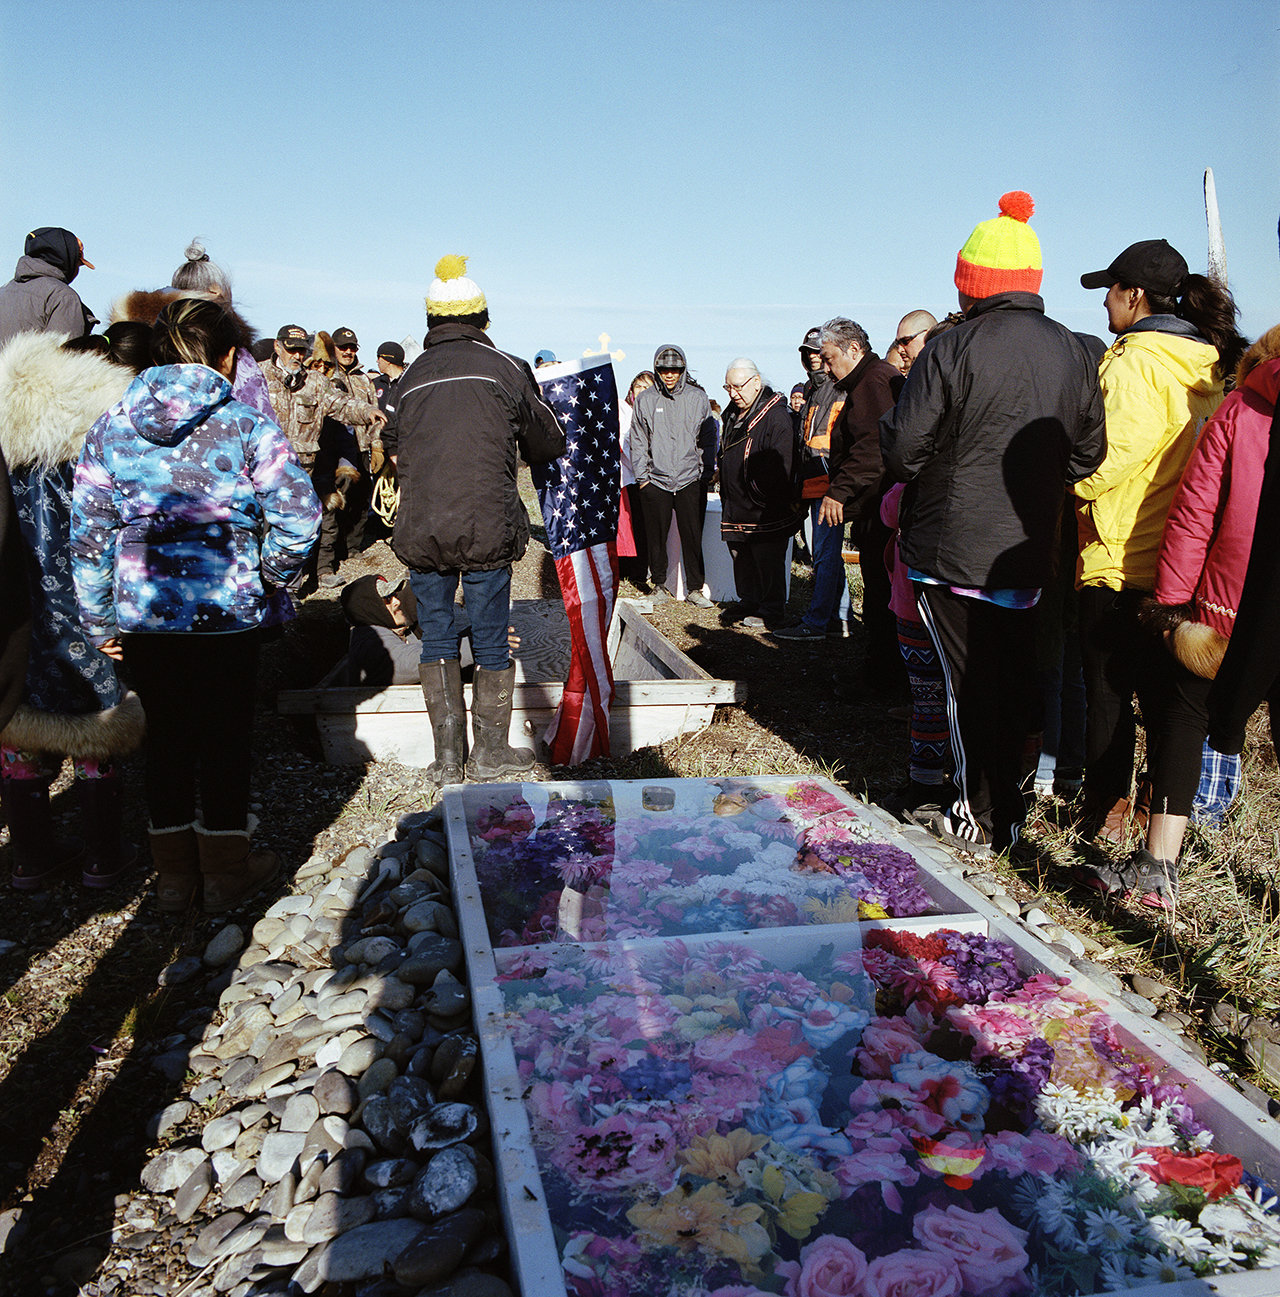 Blurr's funeral, August 2016